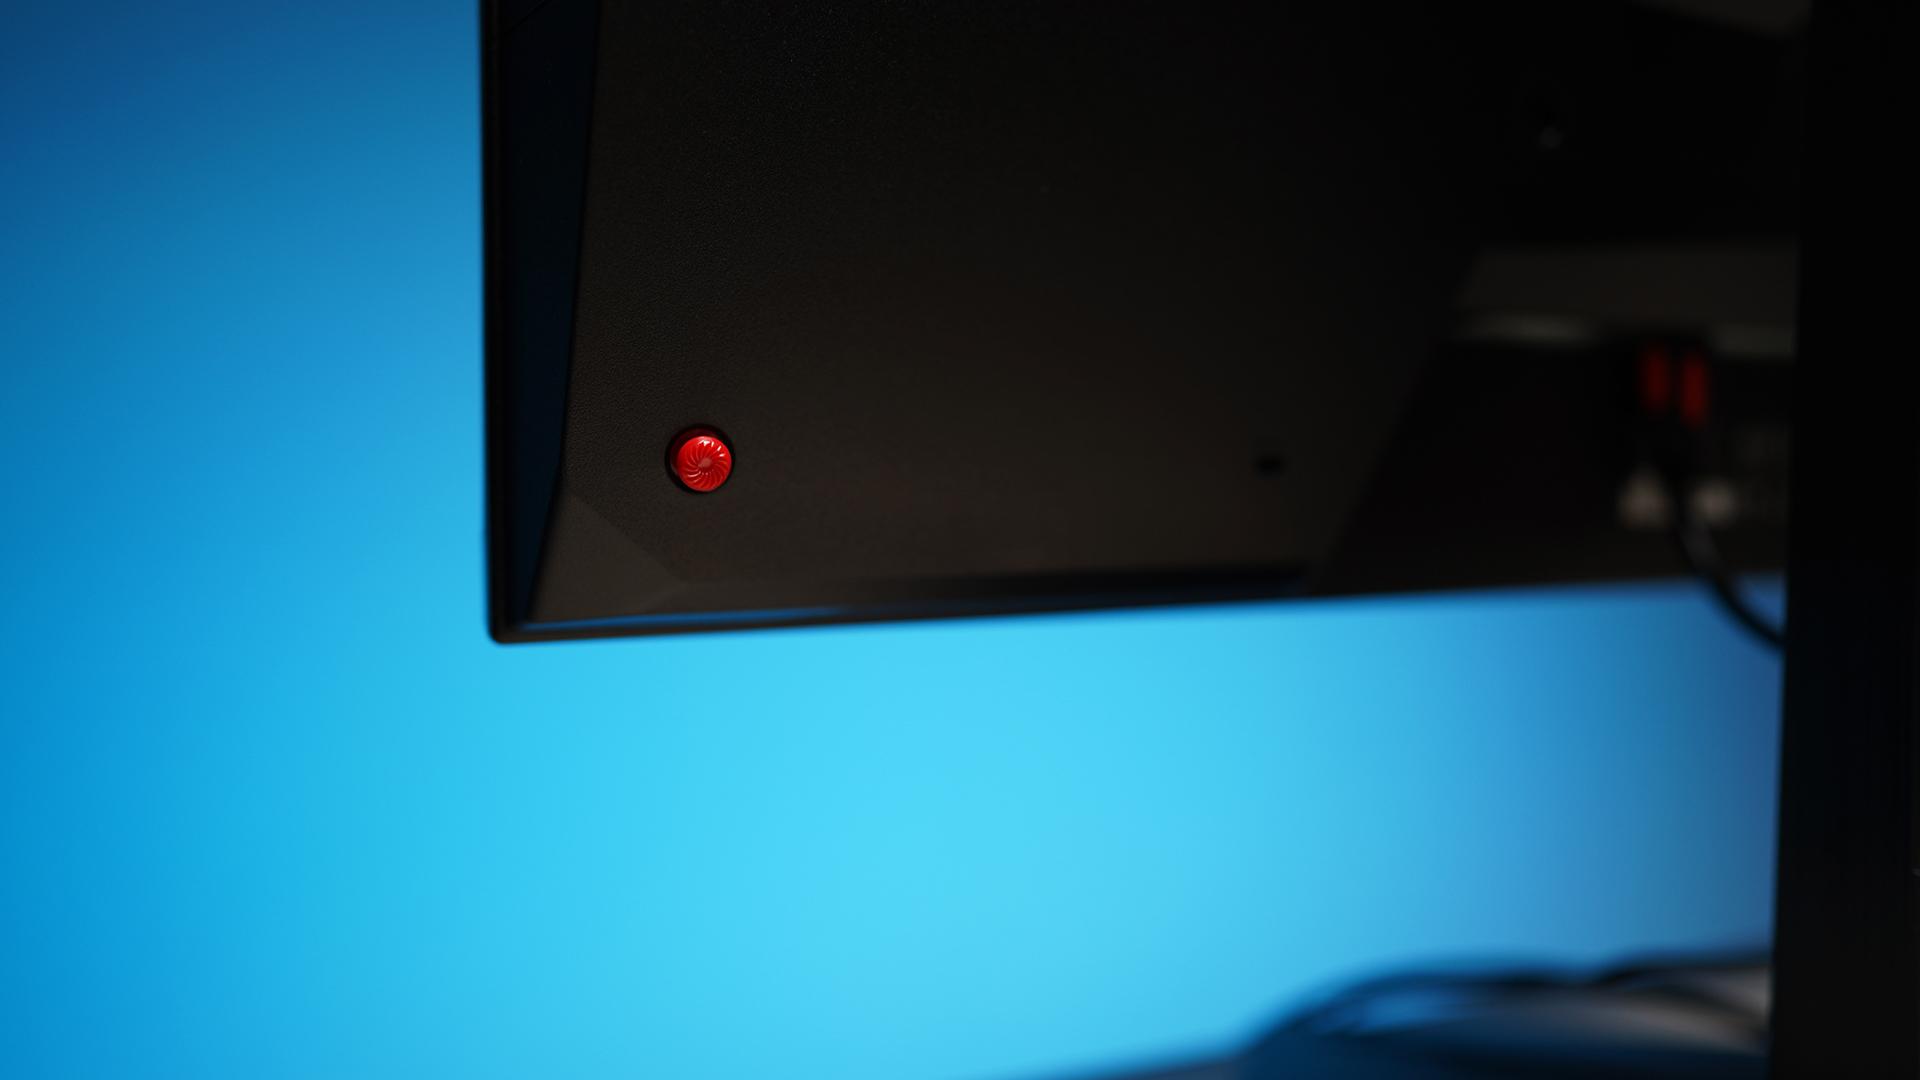 MSI Oculux NXG253R - Design Bedienung Joystick